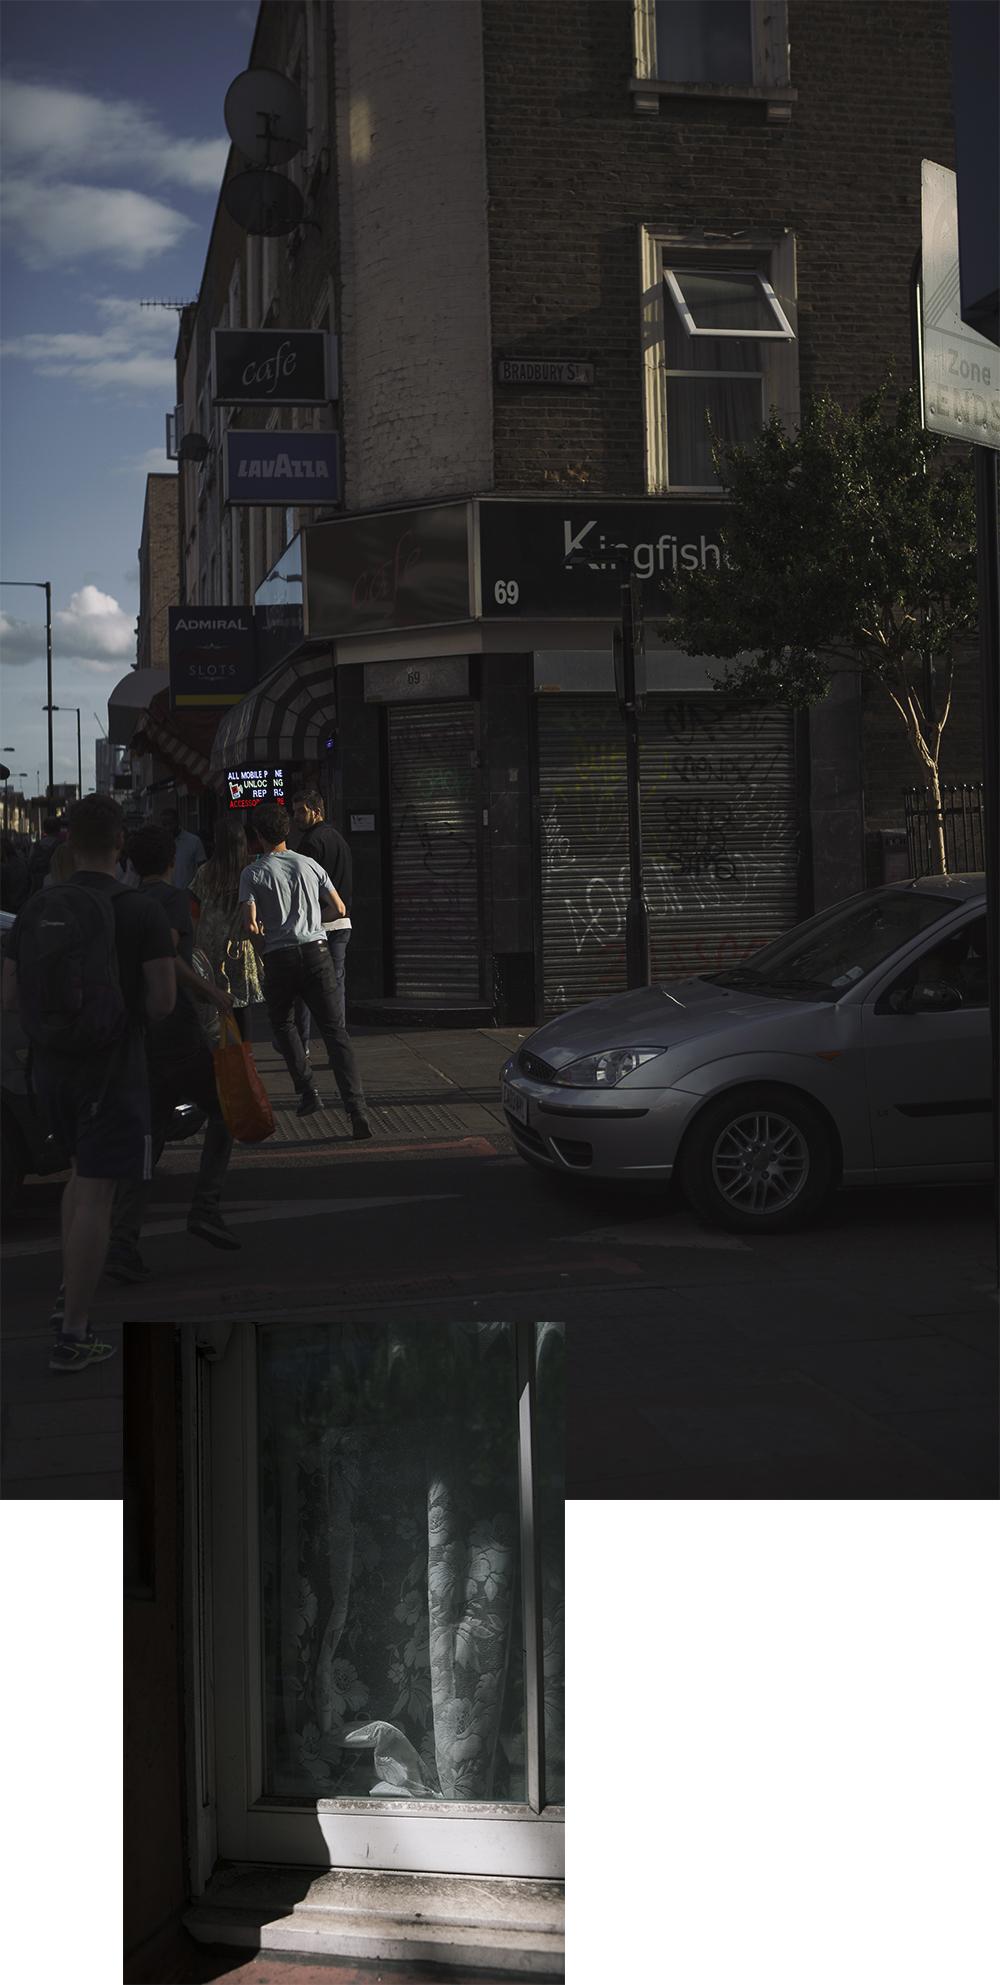 1_London_by_Amelie_NiederbuchnerS, London, Visual Diary, shot by Amelie Niederbuchner, photographer from Munich, blog The Curly Head